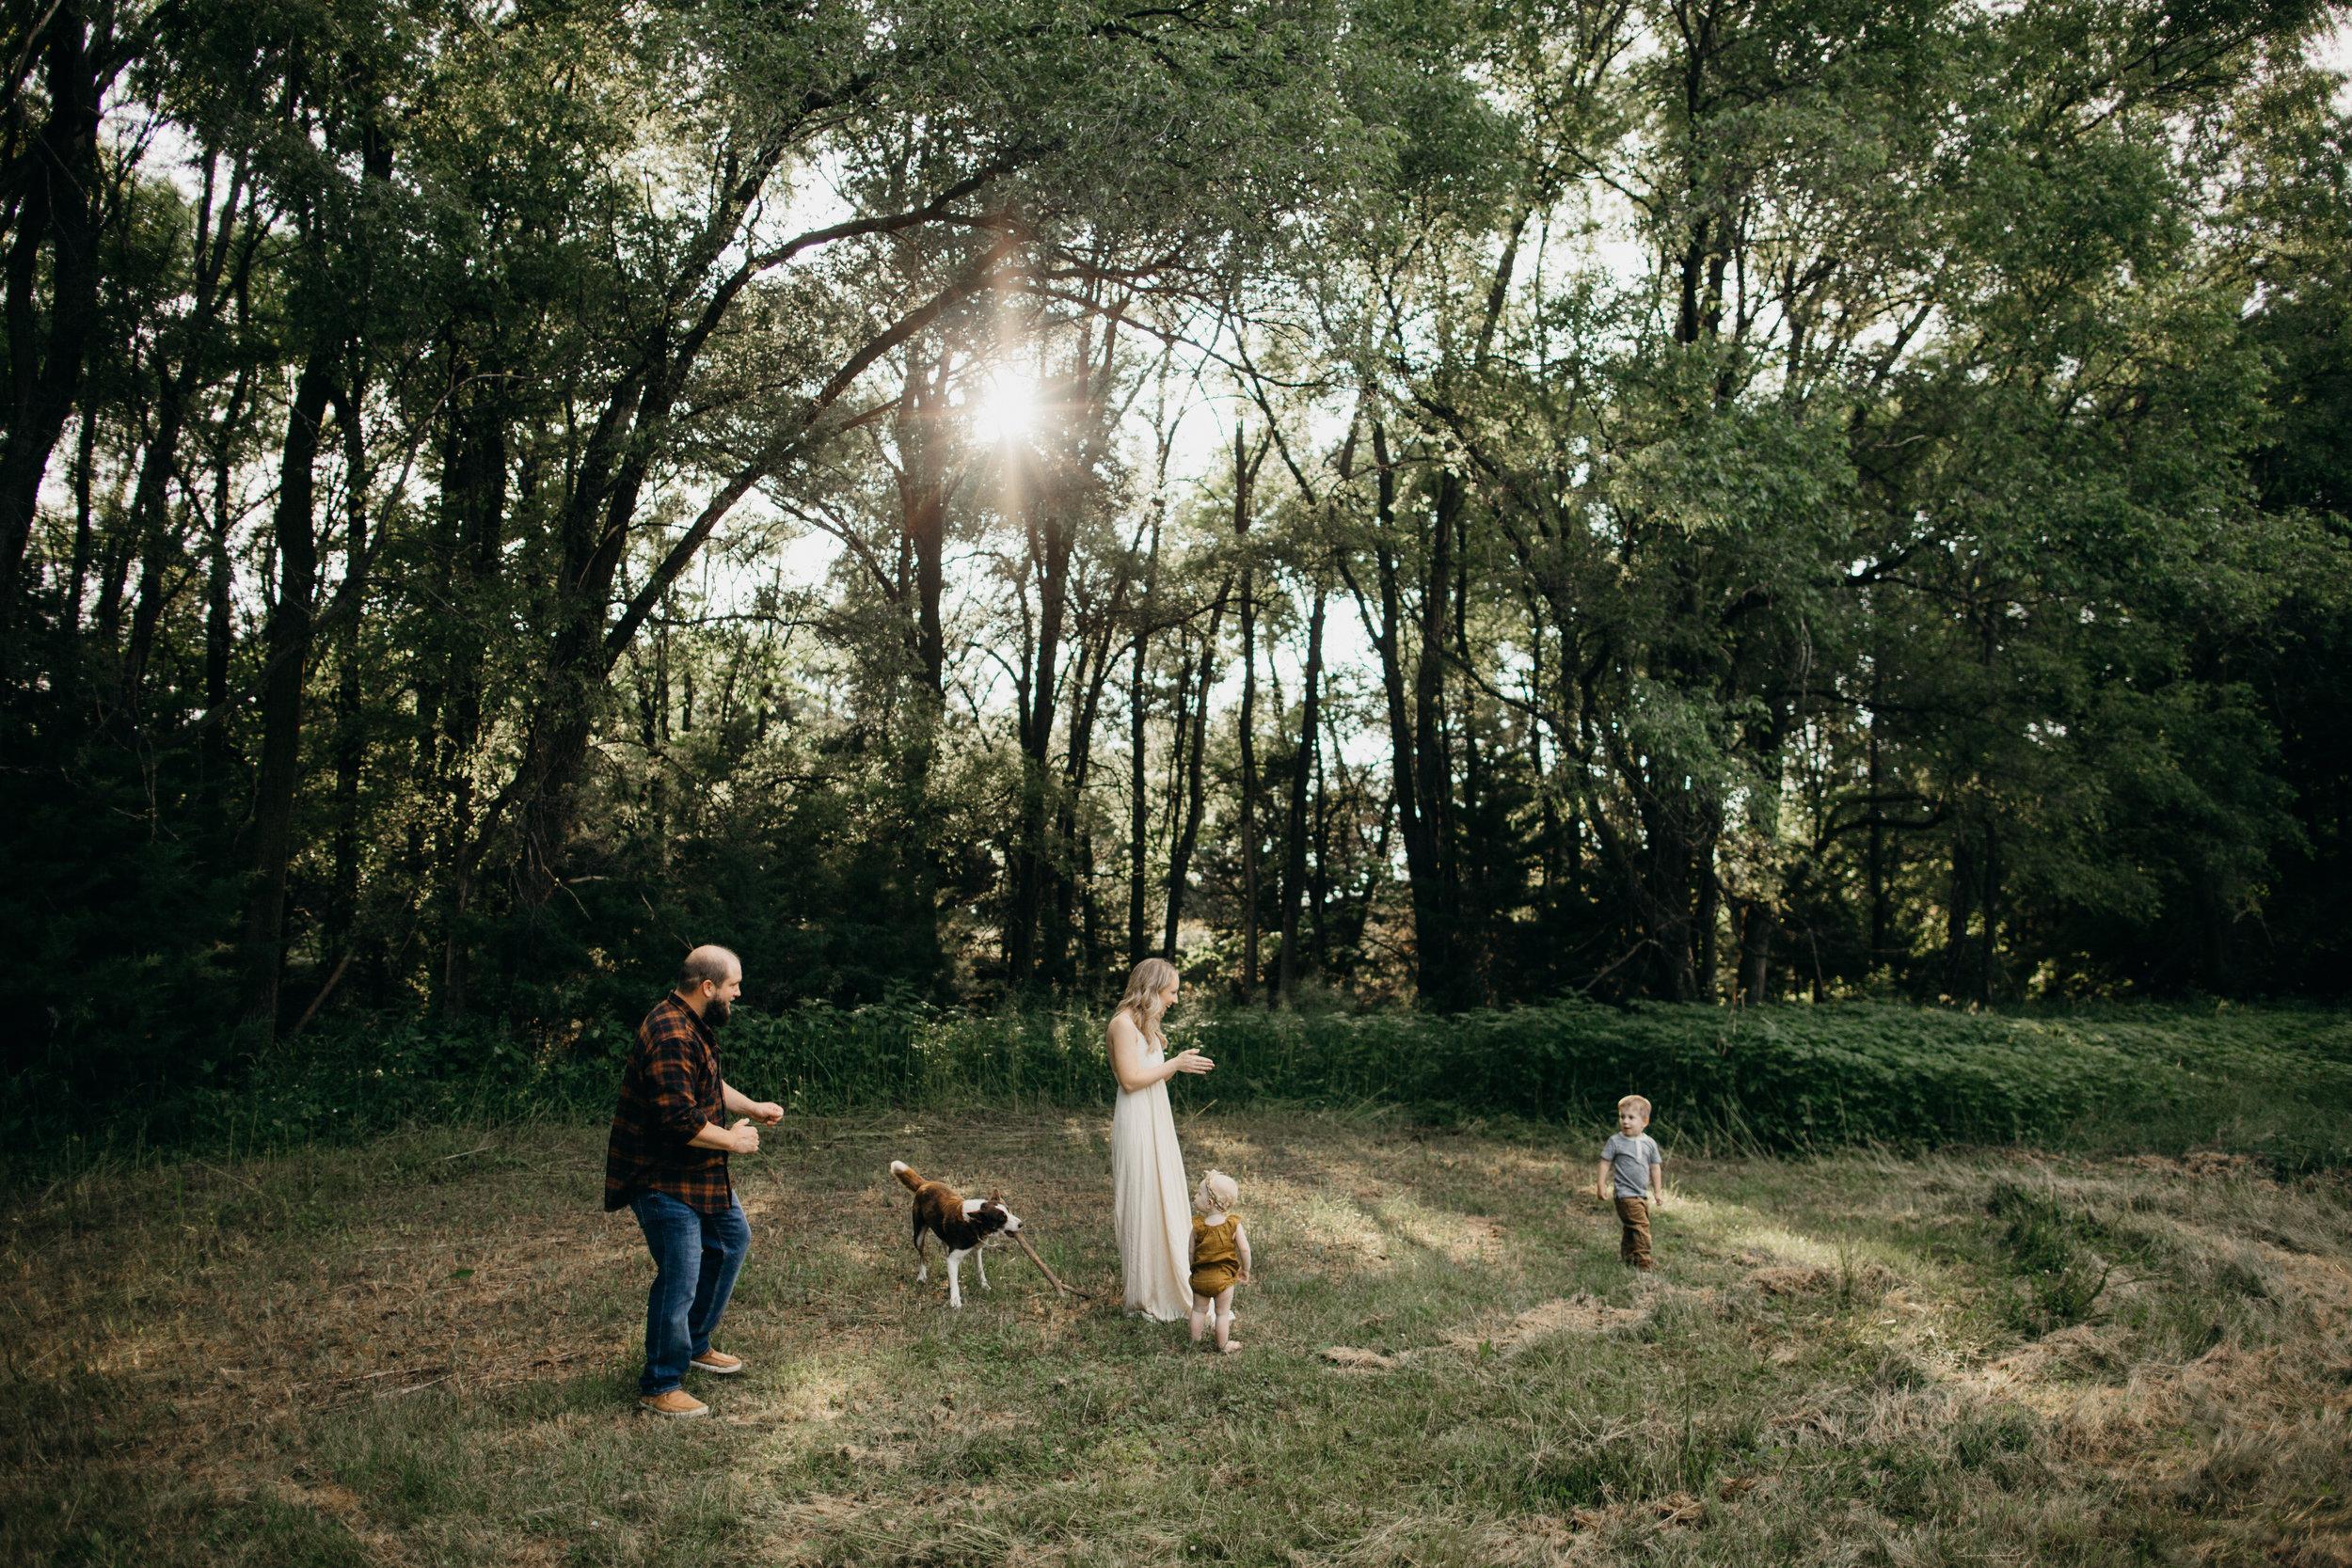 jamieleighmiller_omaha_nebraska_family_photographer-7.jpg